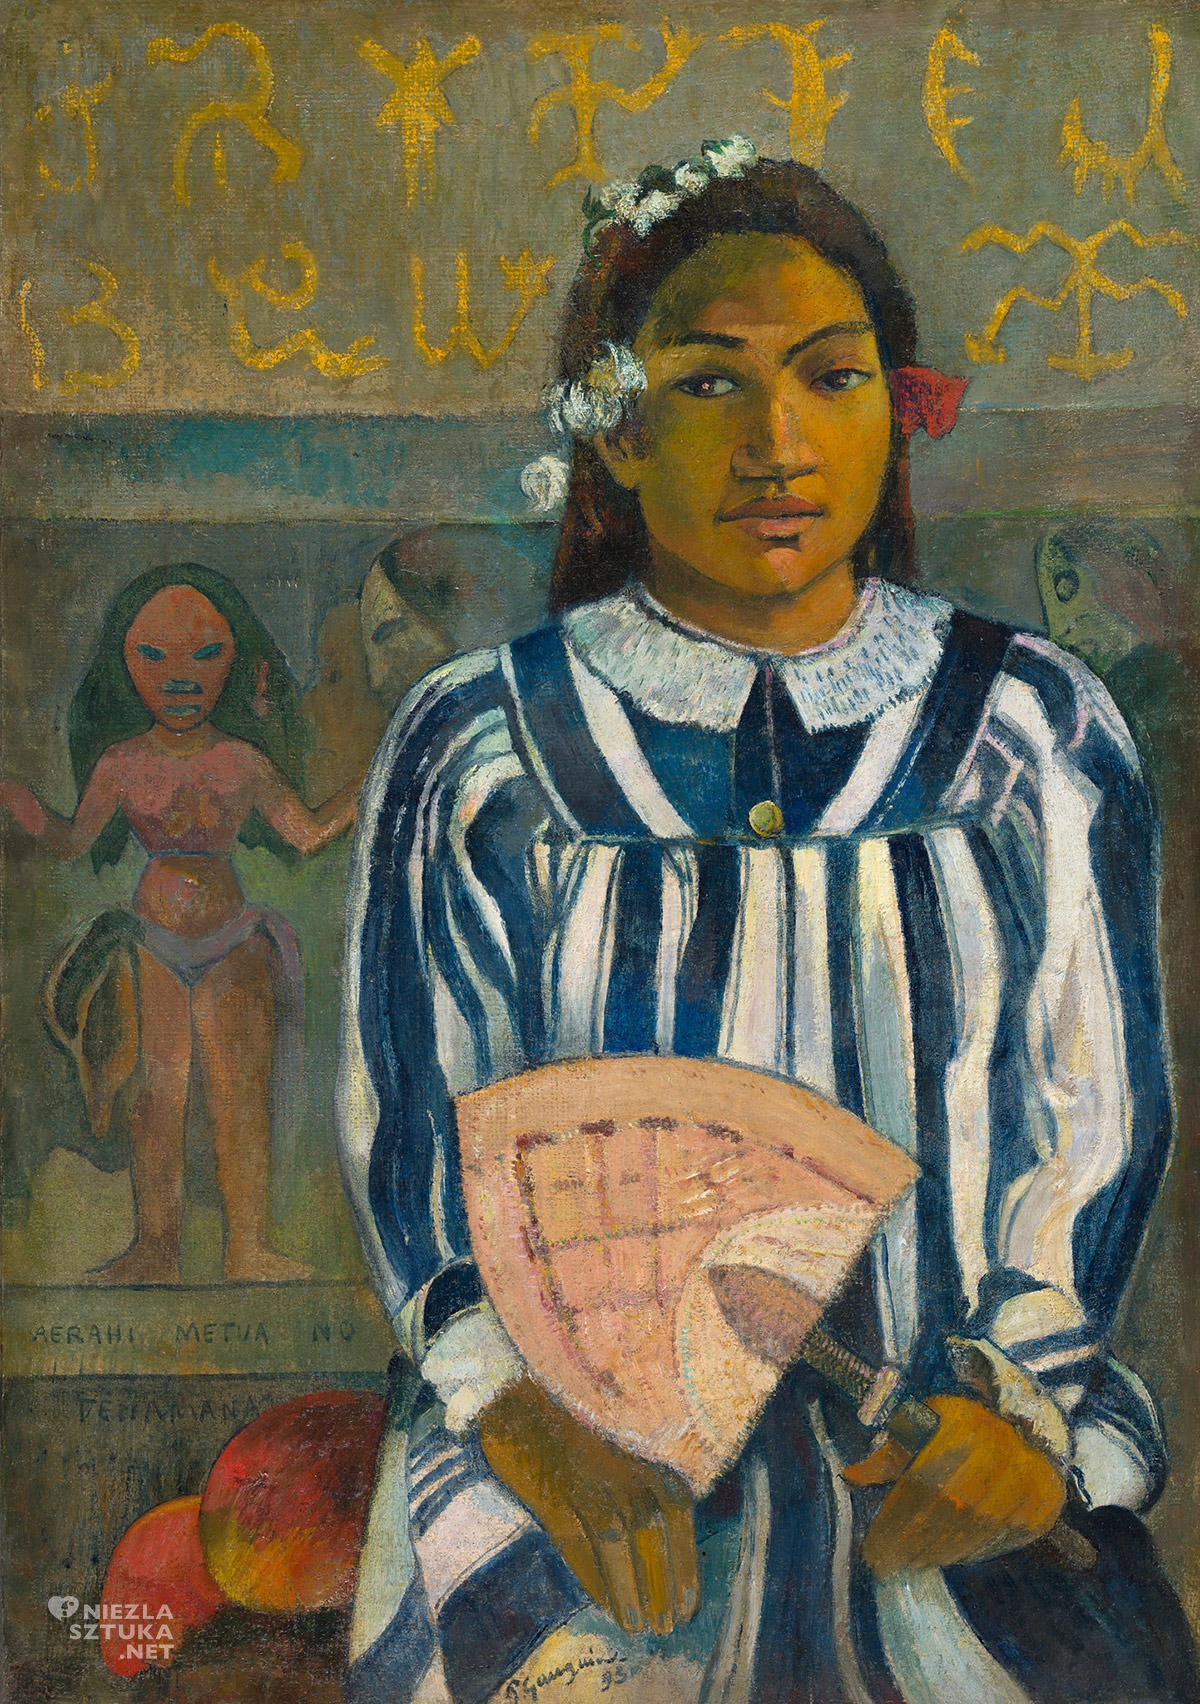 Paul Gauguin, Merahi metua no Tehamana, Tehamana ma wielu rodziców, Tahiti, Niezła Sztuka